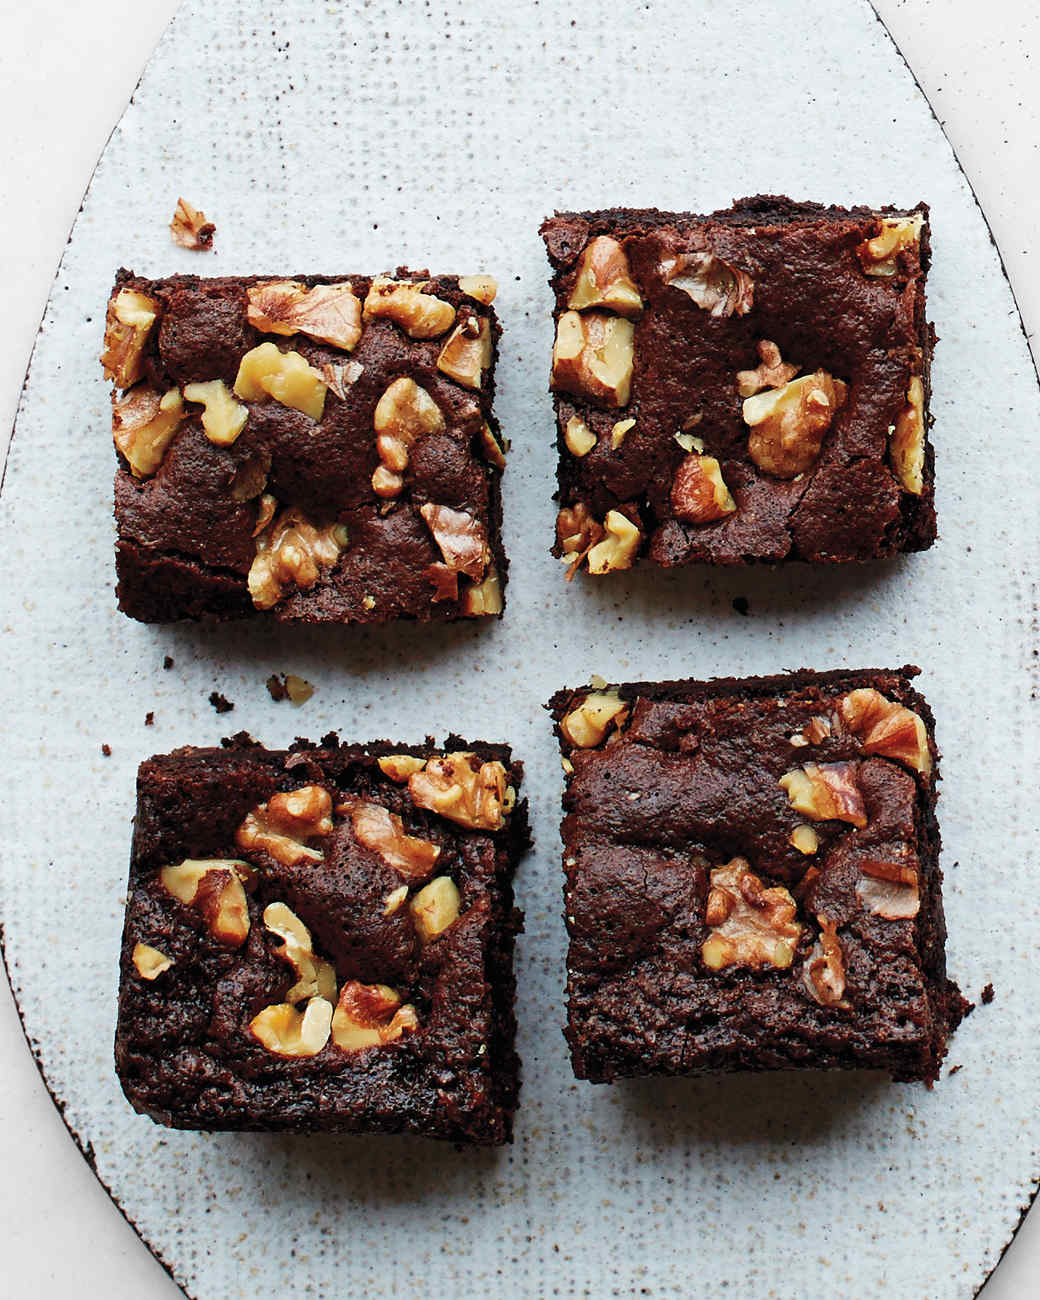 chocolate-walnut-brownies-9780307954596-art-1214.jpg